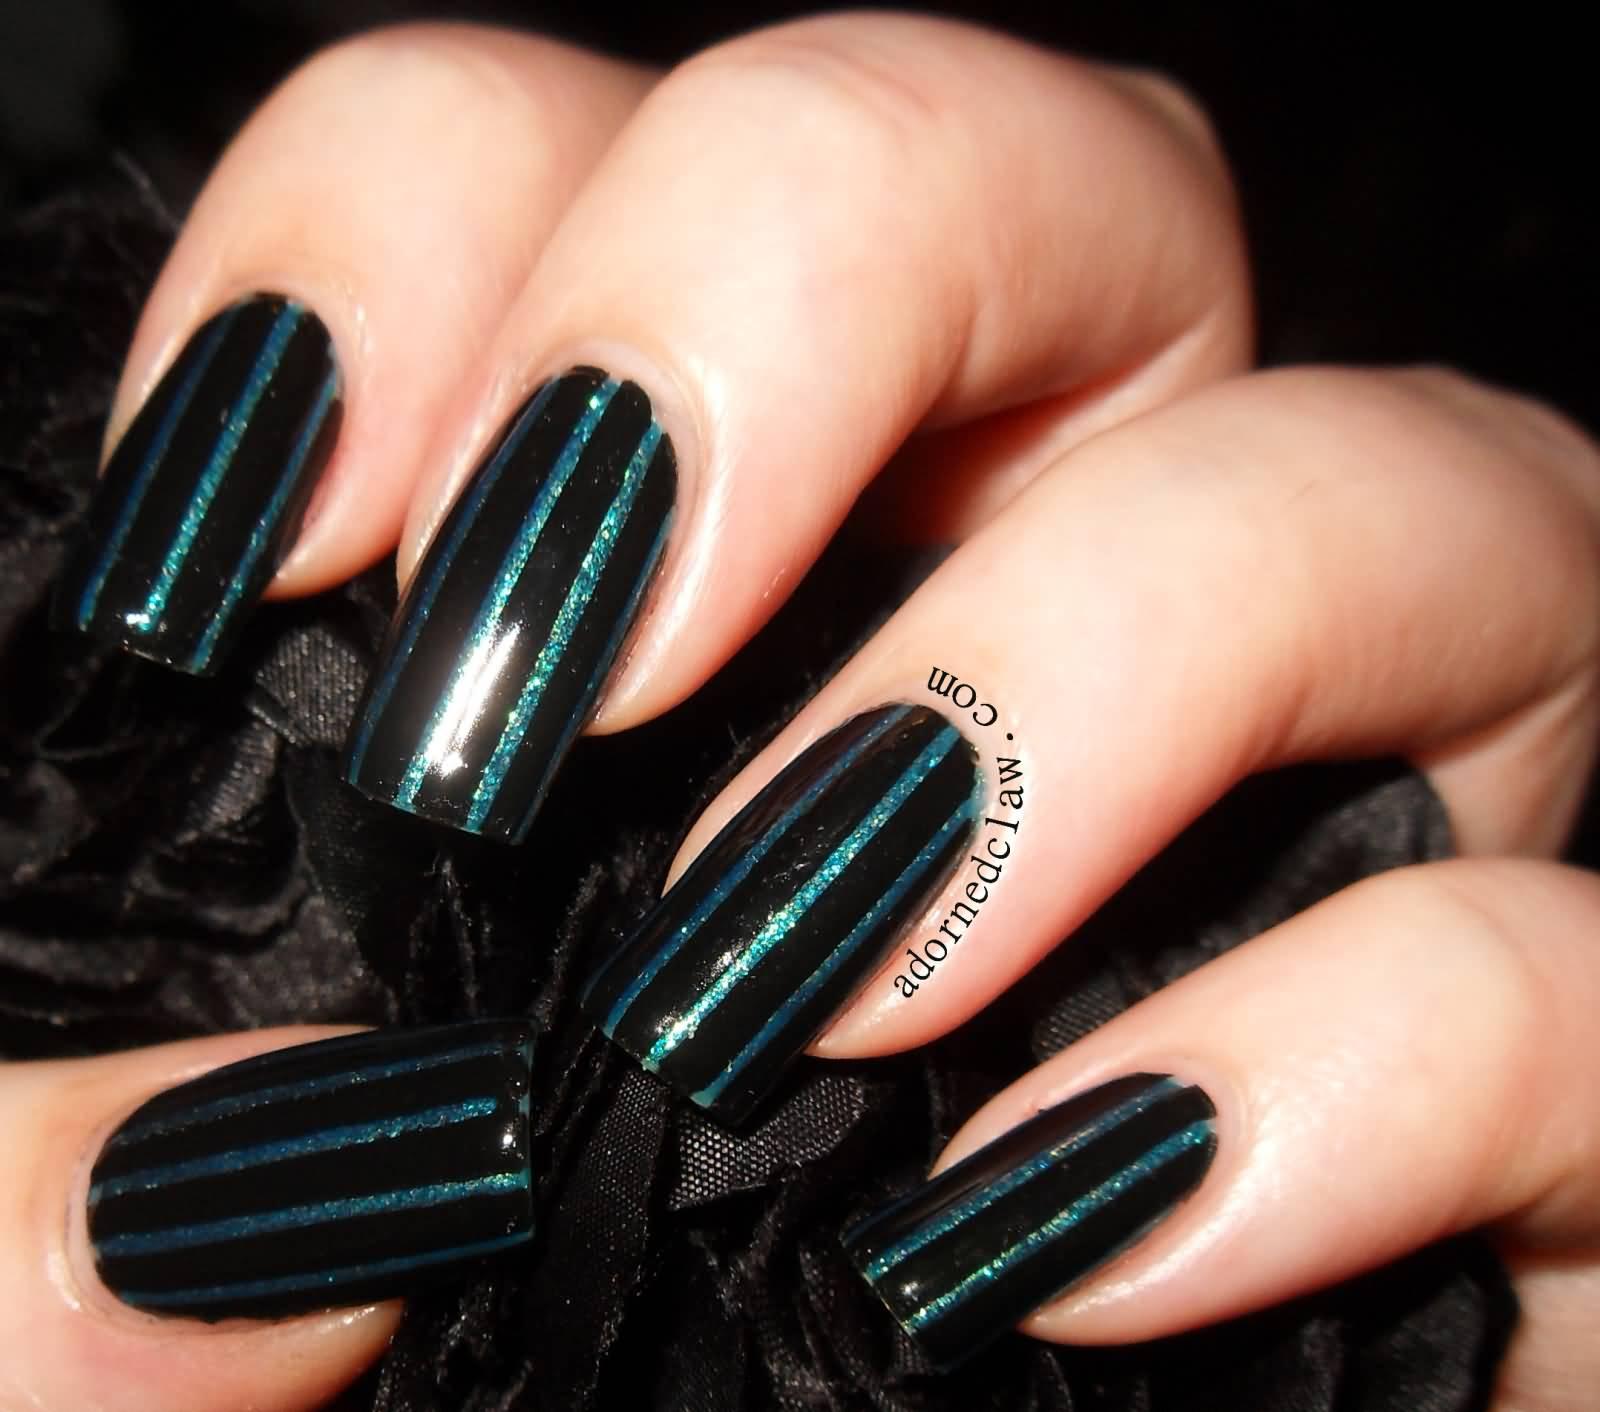 Black Nail Art: 65 Most Stylish Green And Black Nail Art Design Ideas